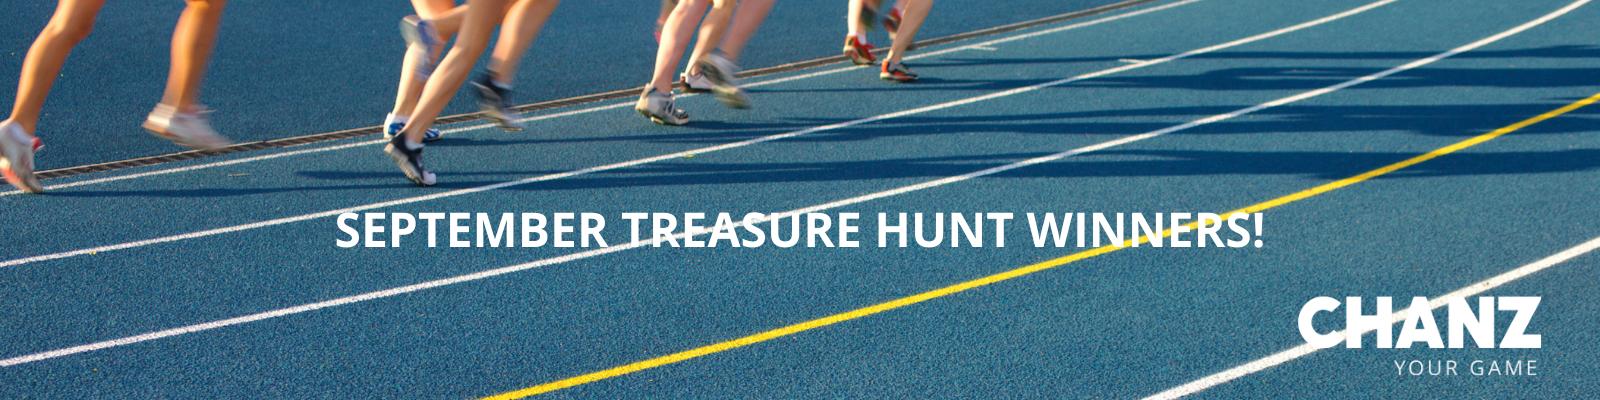 September Treasure Hunt Winners!